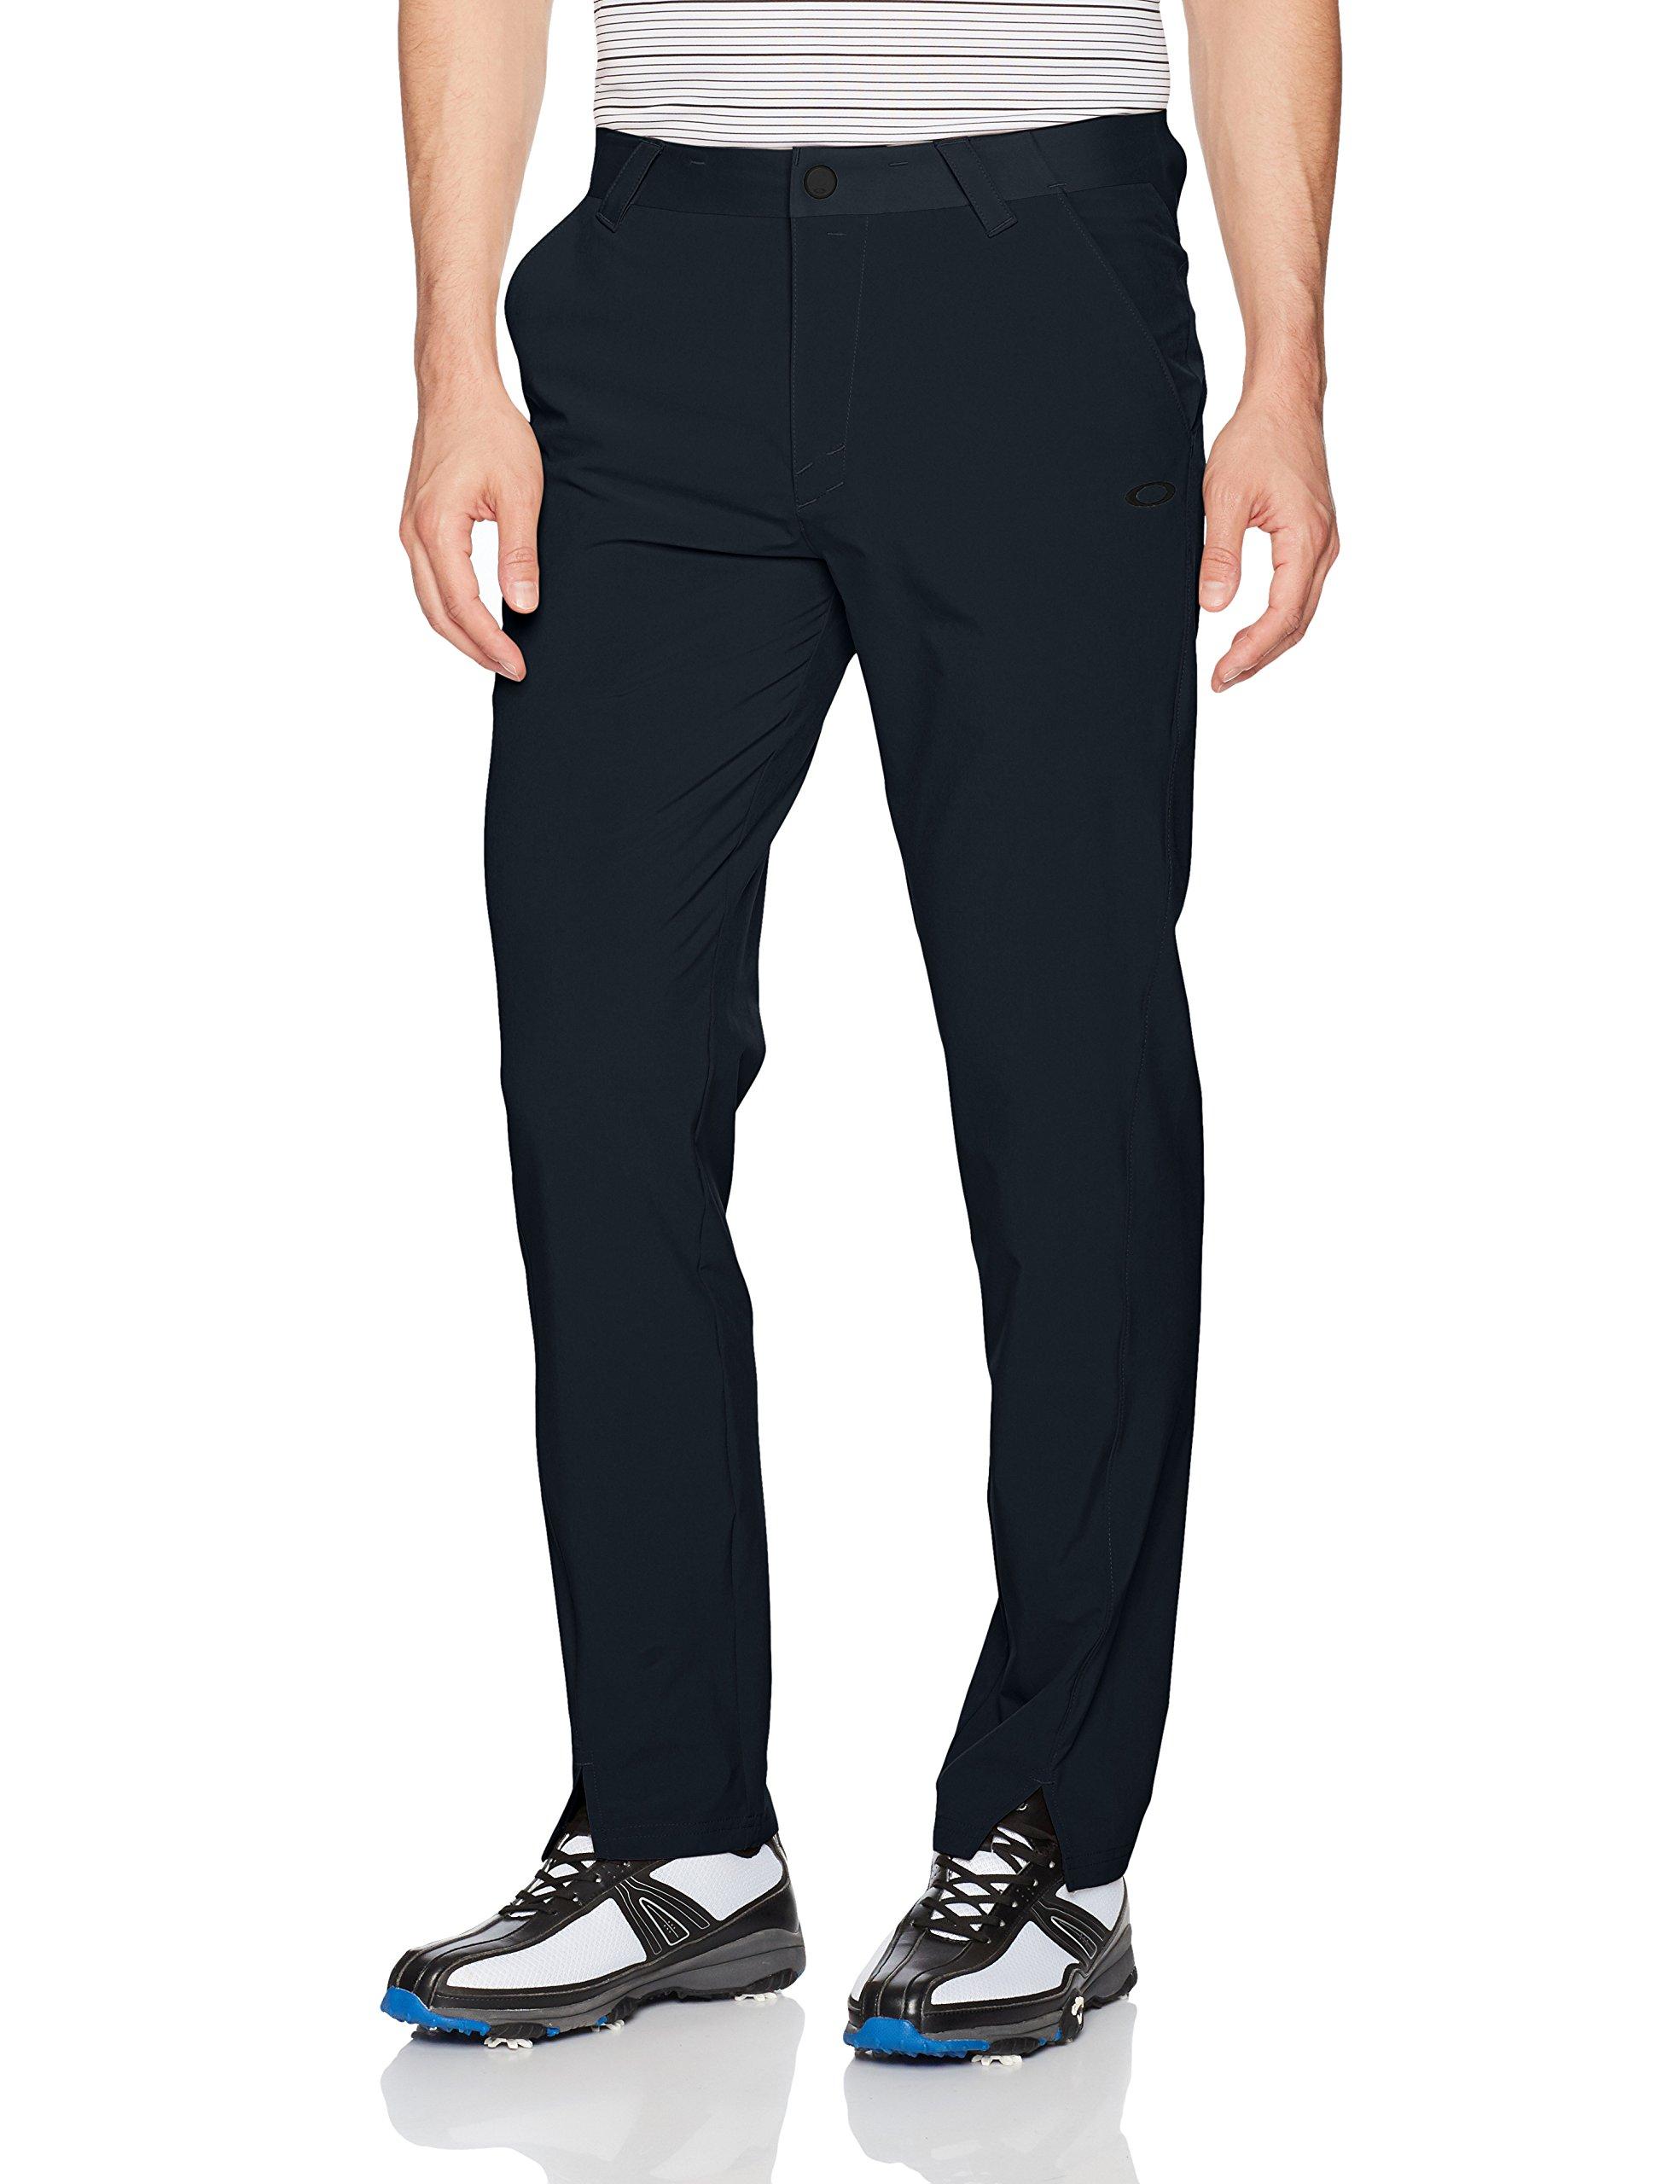 Oakley Men's Velocity Pant, Blackout, 31X32